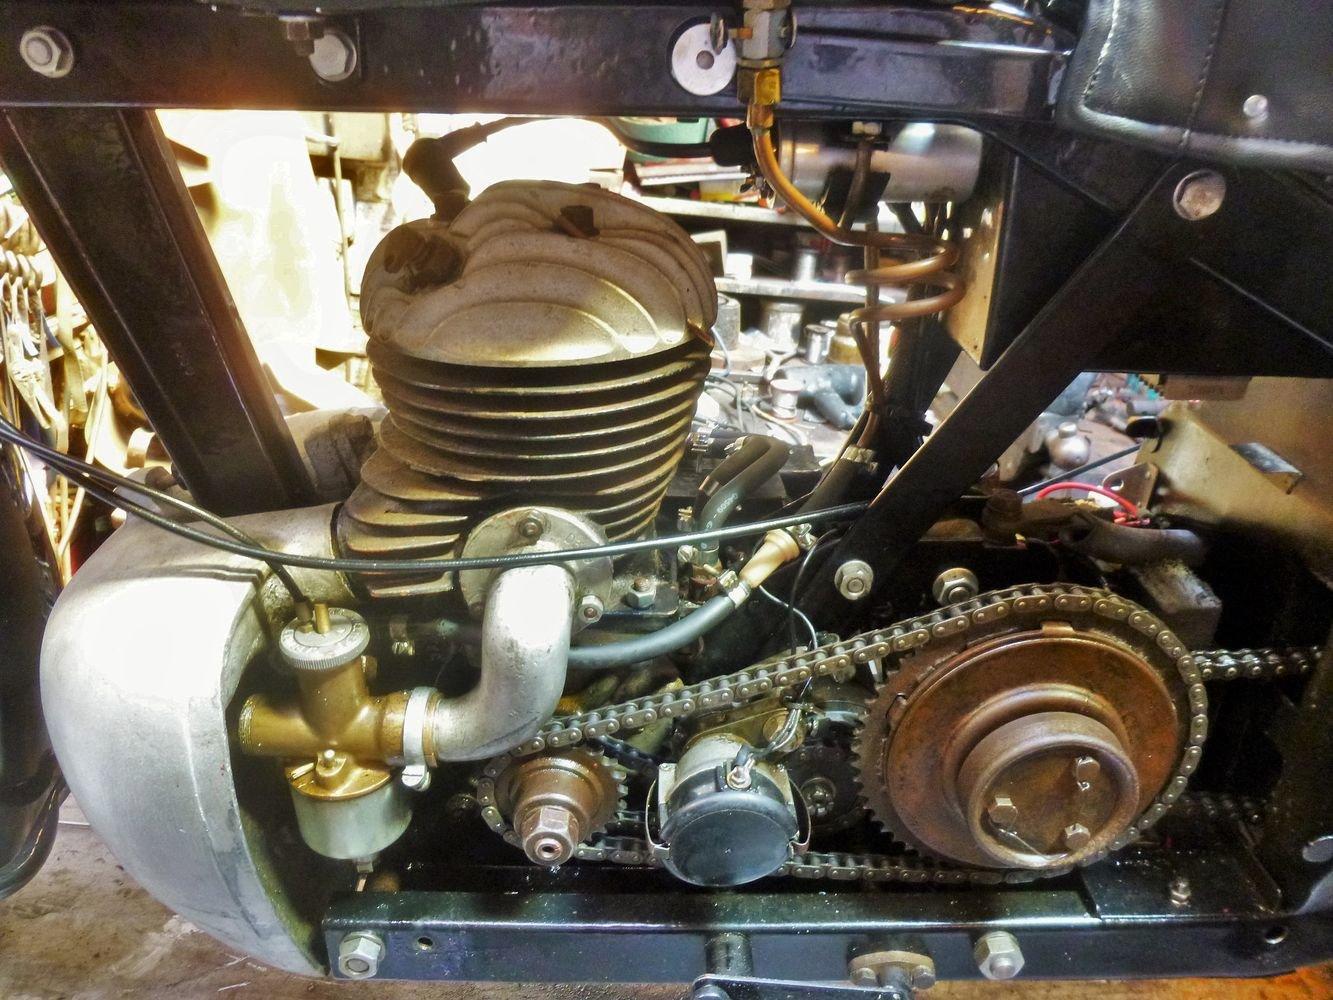 1934 Francis Barnett Cruiser 39 250cc For Sale (picture 3 of 6)